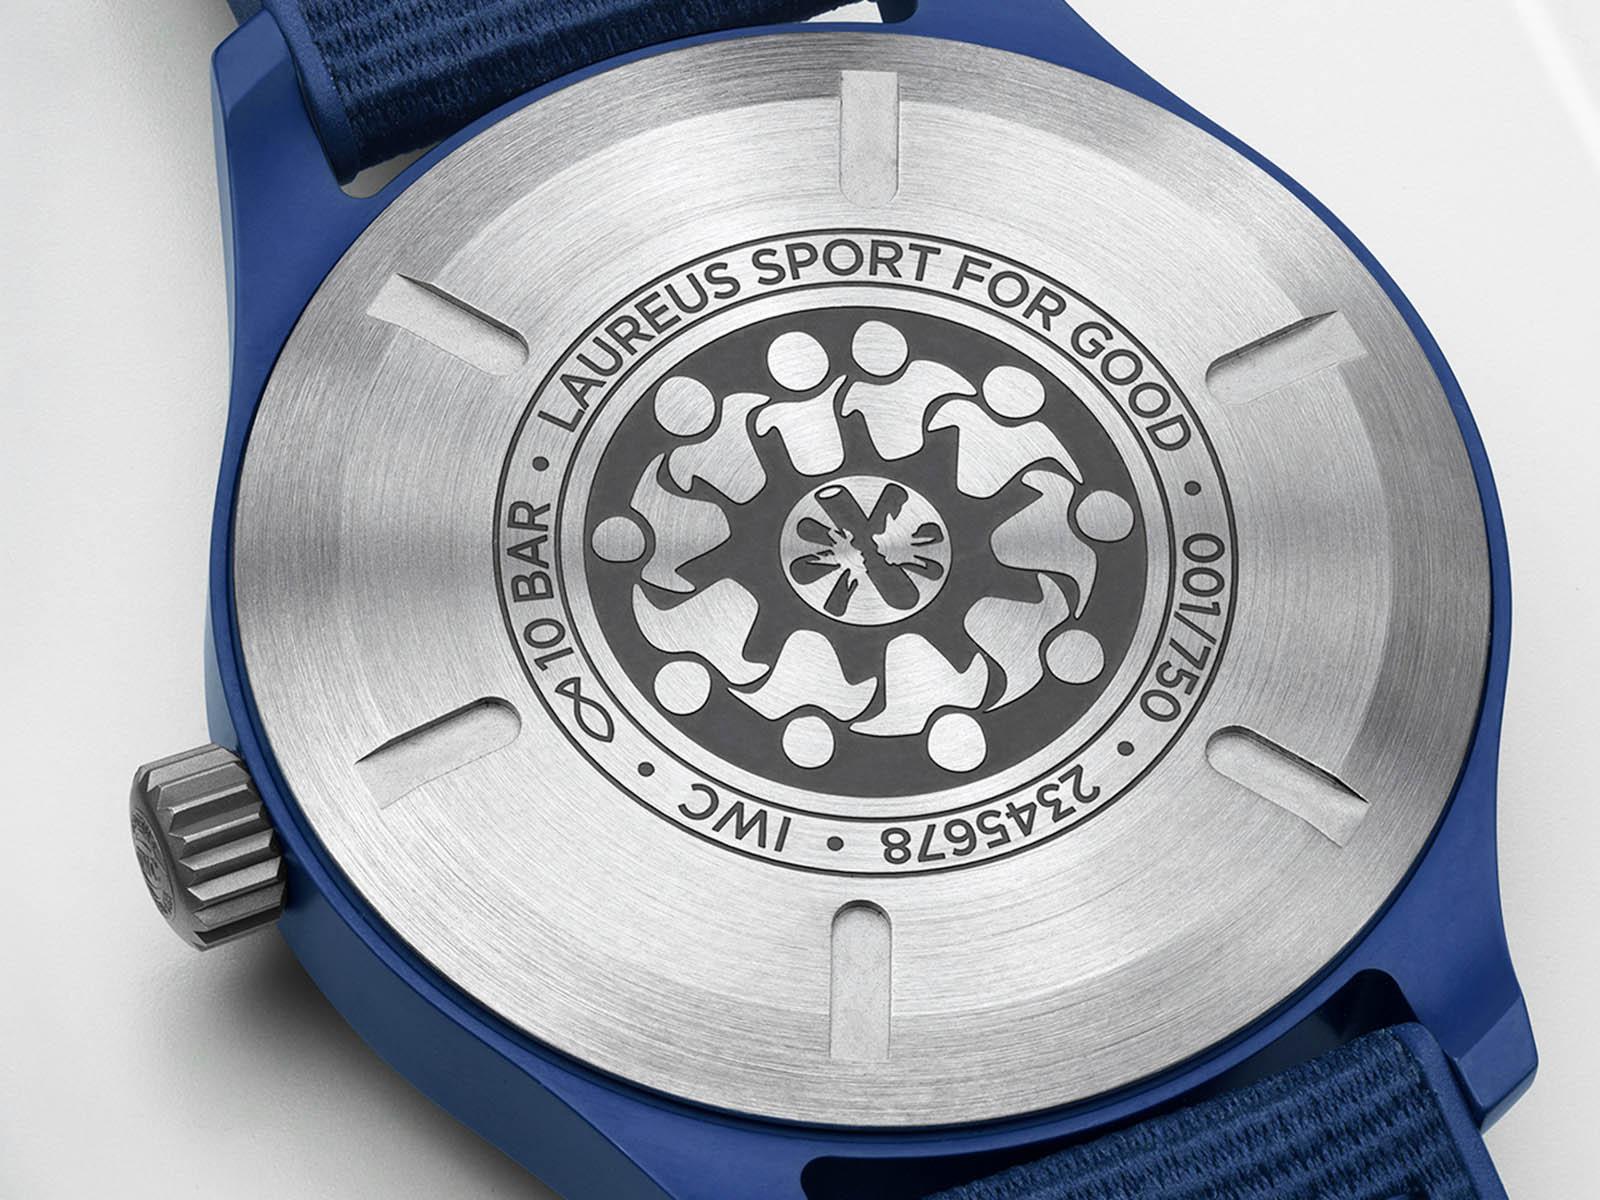 iw328101-iwc-pilot-s-watch-automatic-edition-laureus-sport-for-good-5.jpg